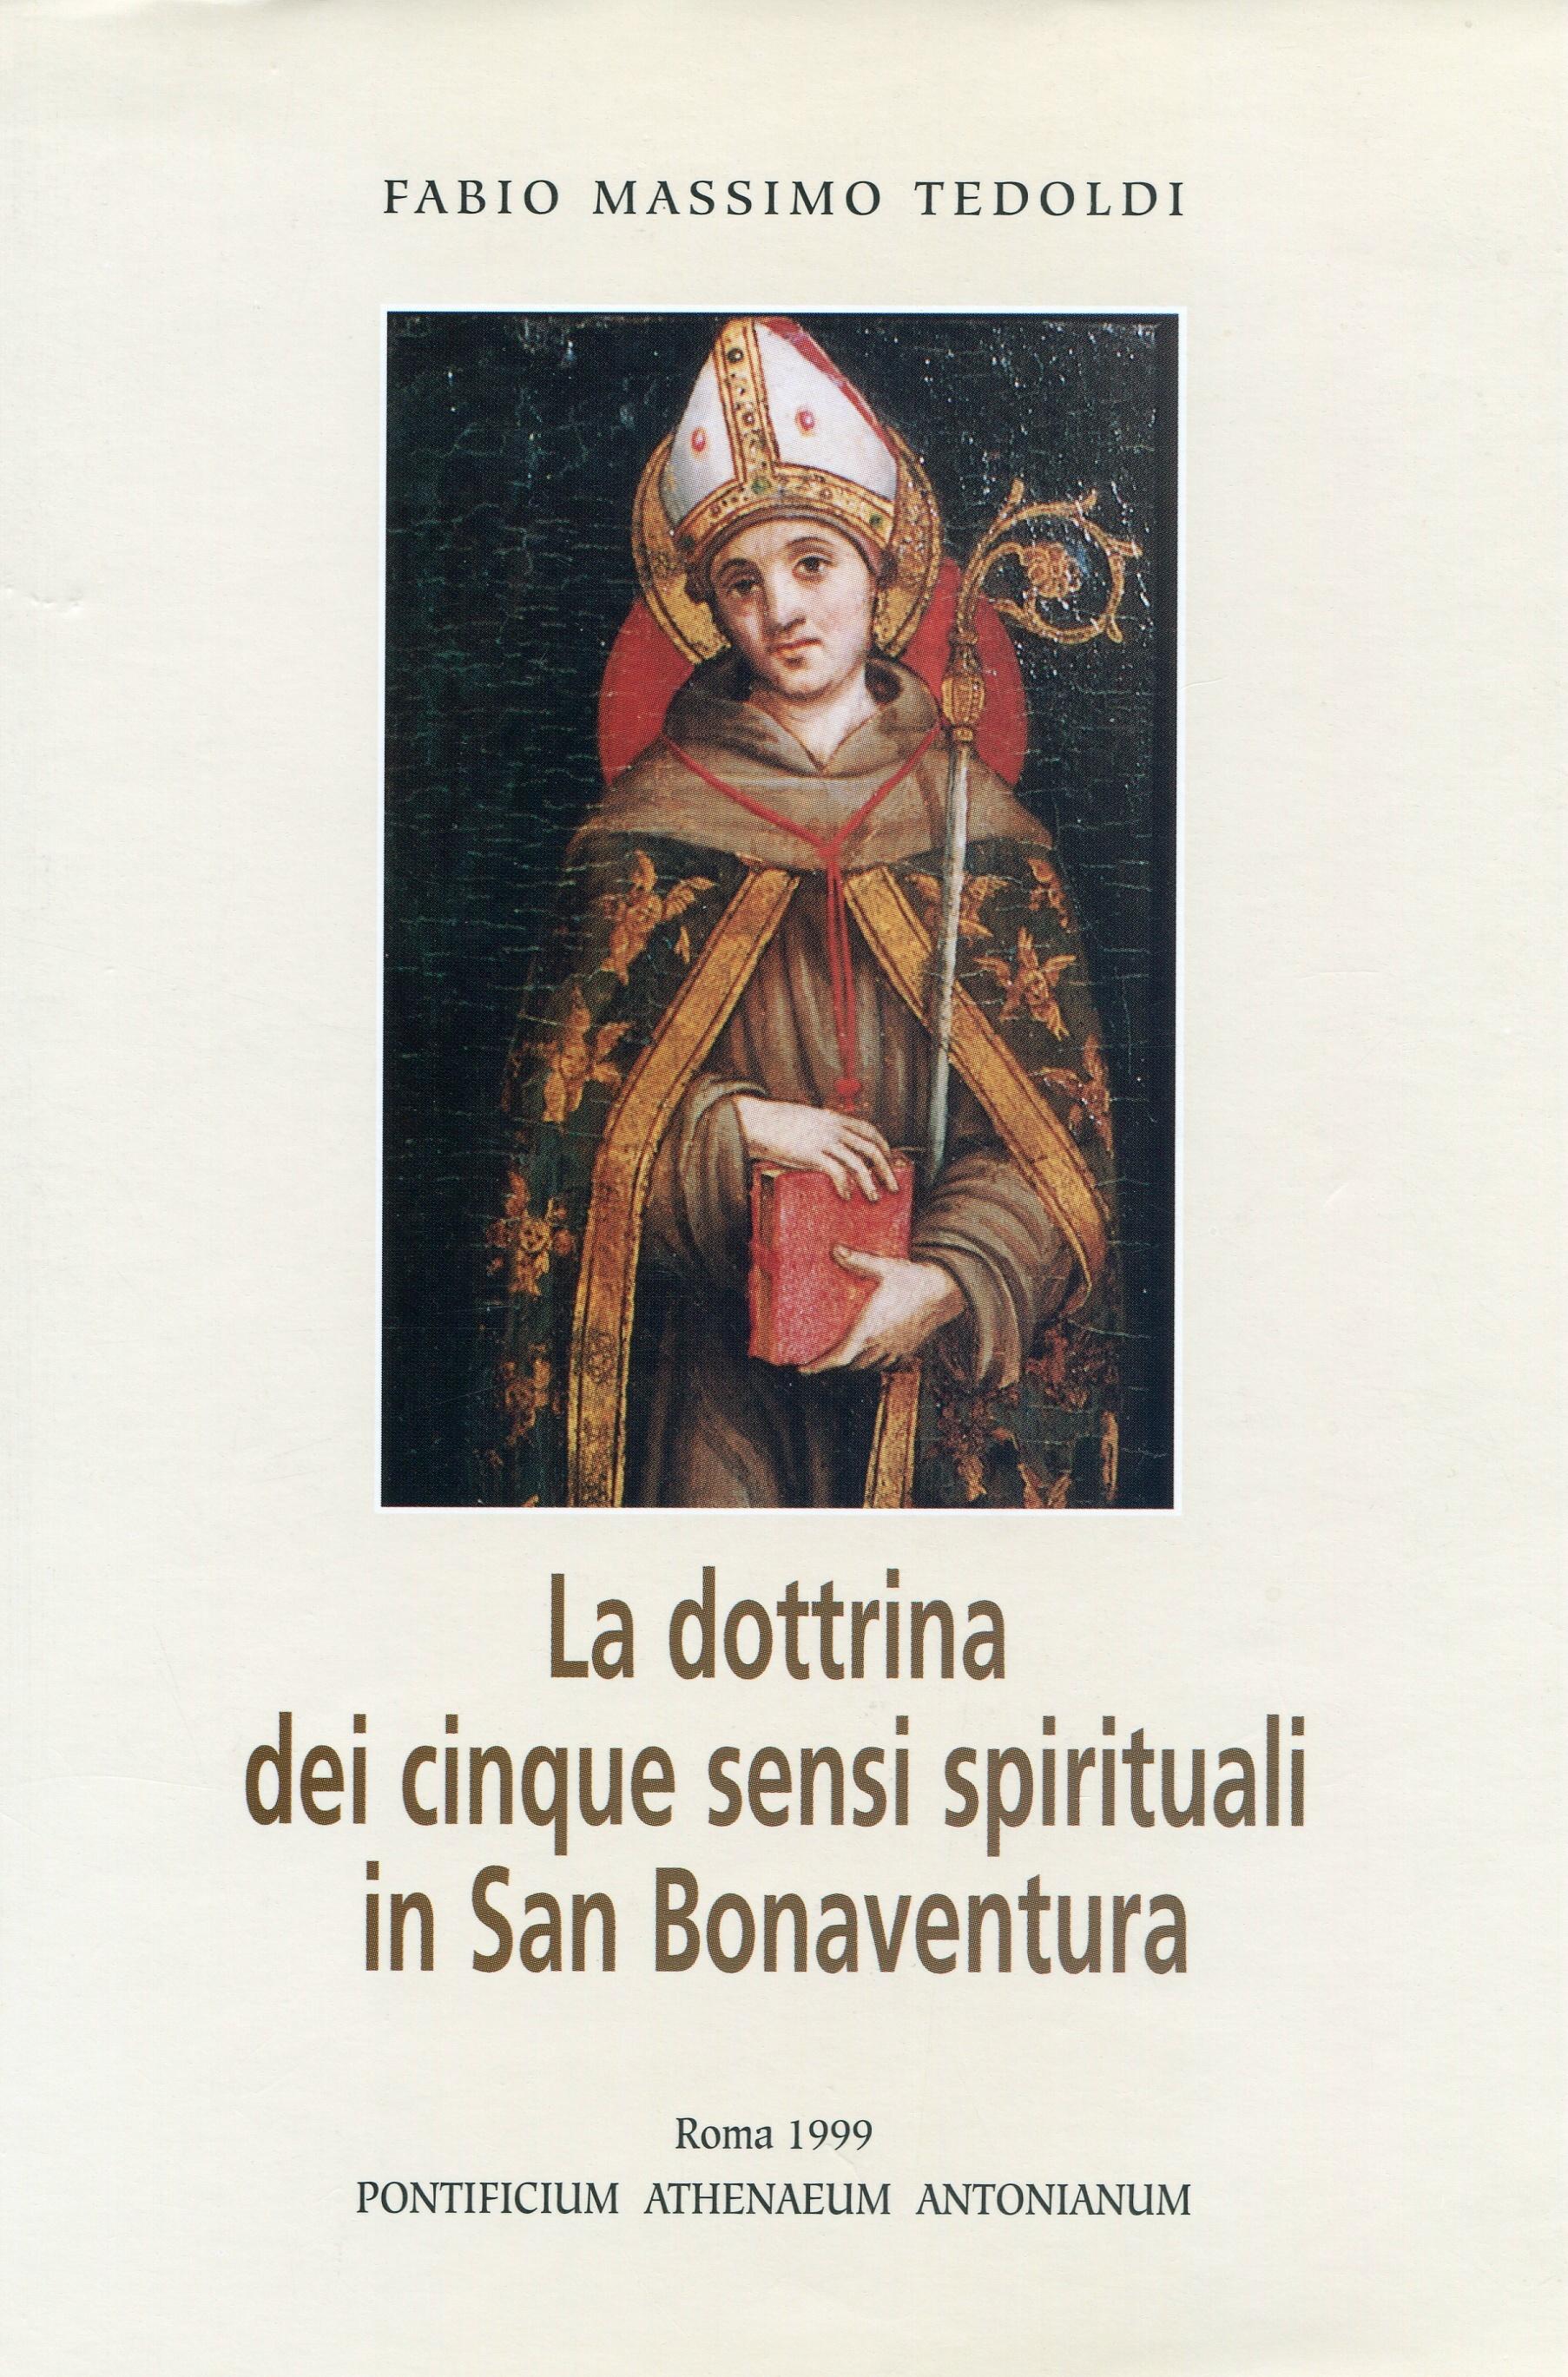 La dottrina dei cinque sensi spirituali in san Bonaventura